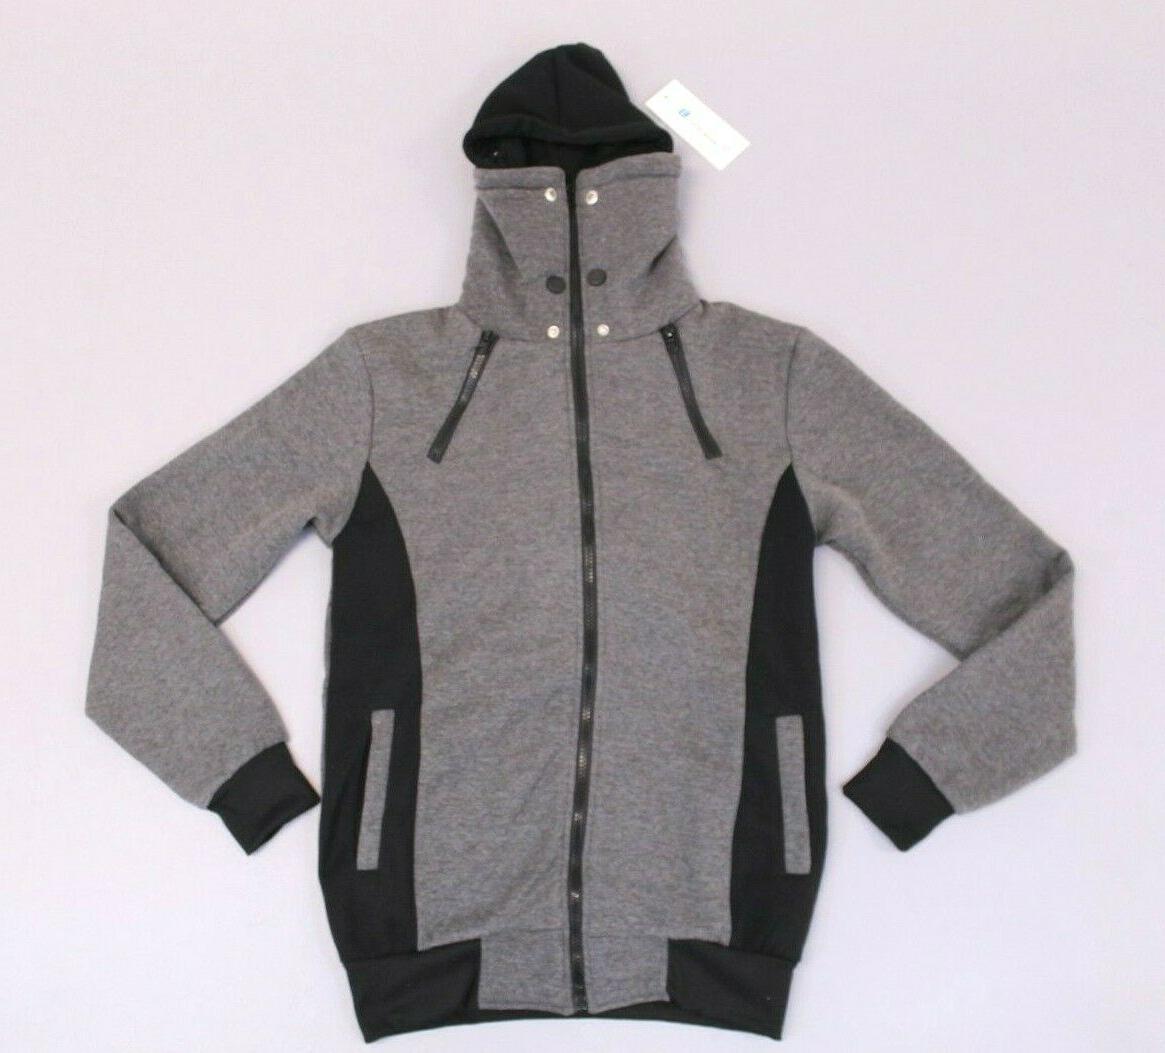 LocalMode Men's Double Zipper Hoodie Jacket Size NWT